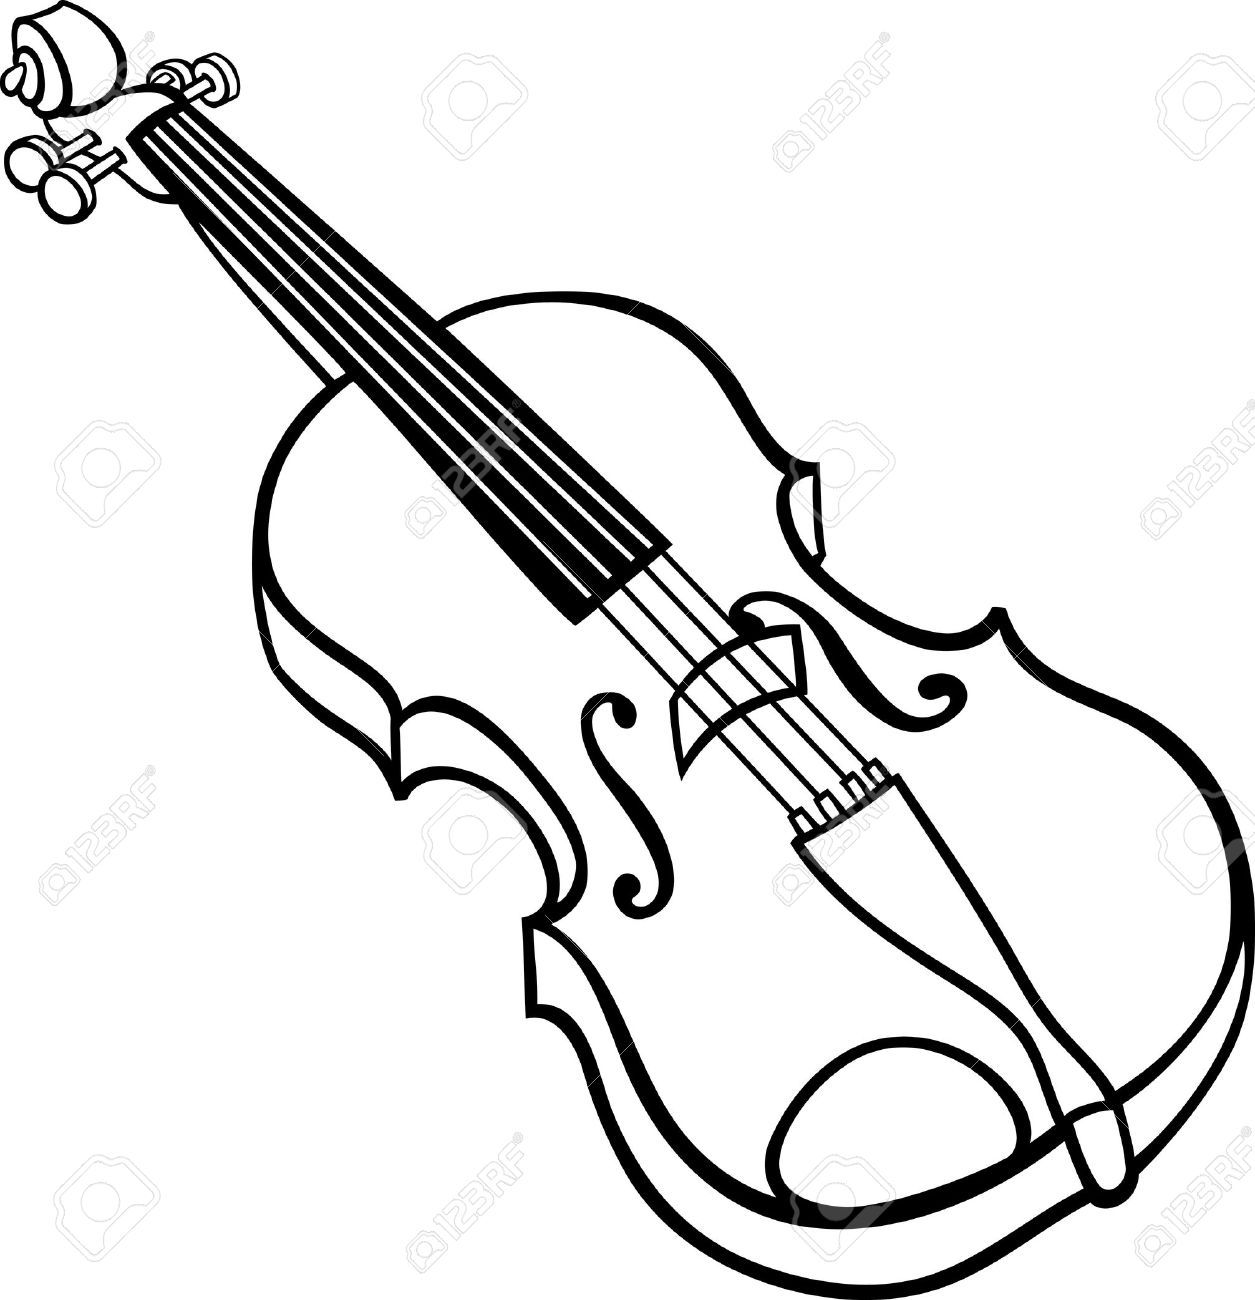 Black And White Cartoon Illustration Of Violin Musical